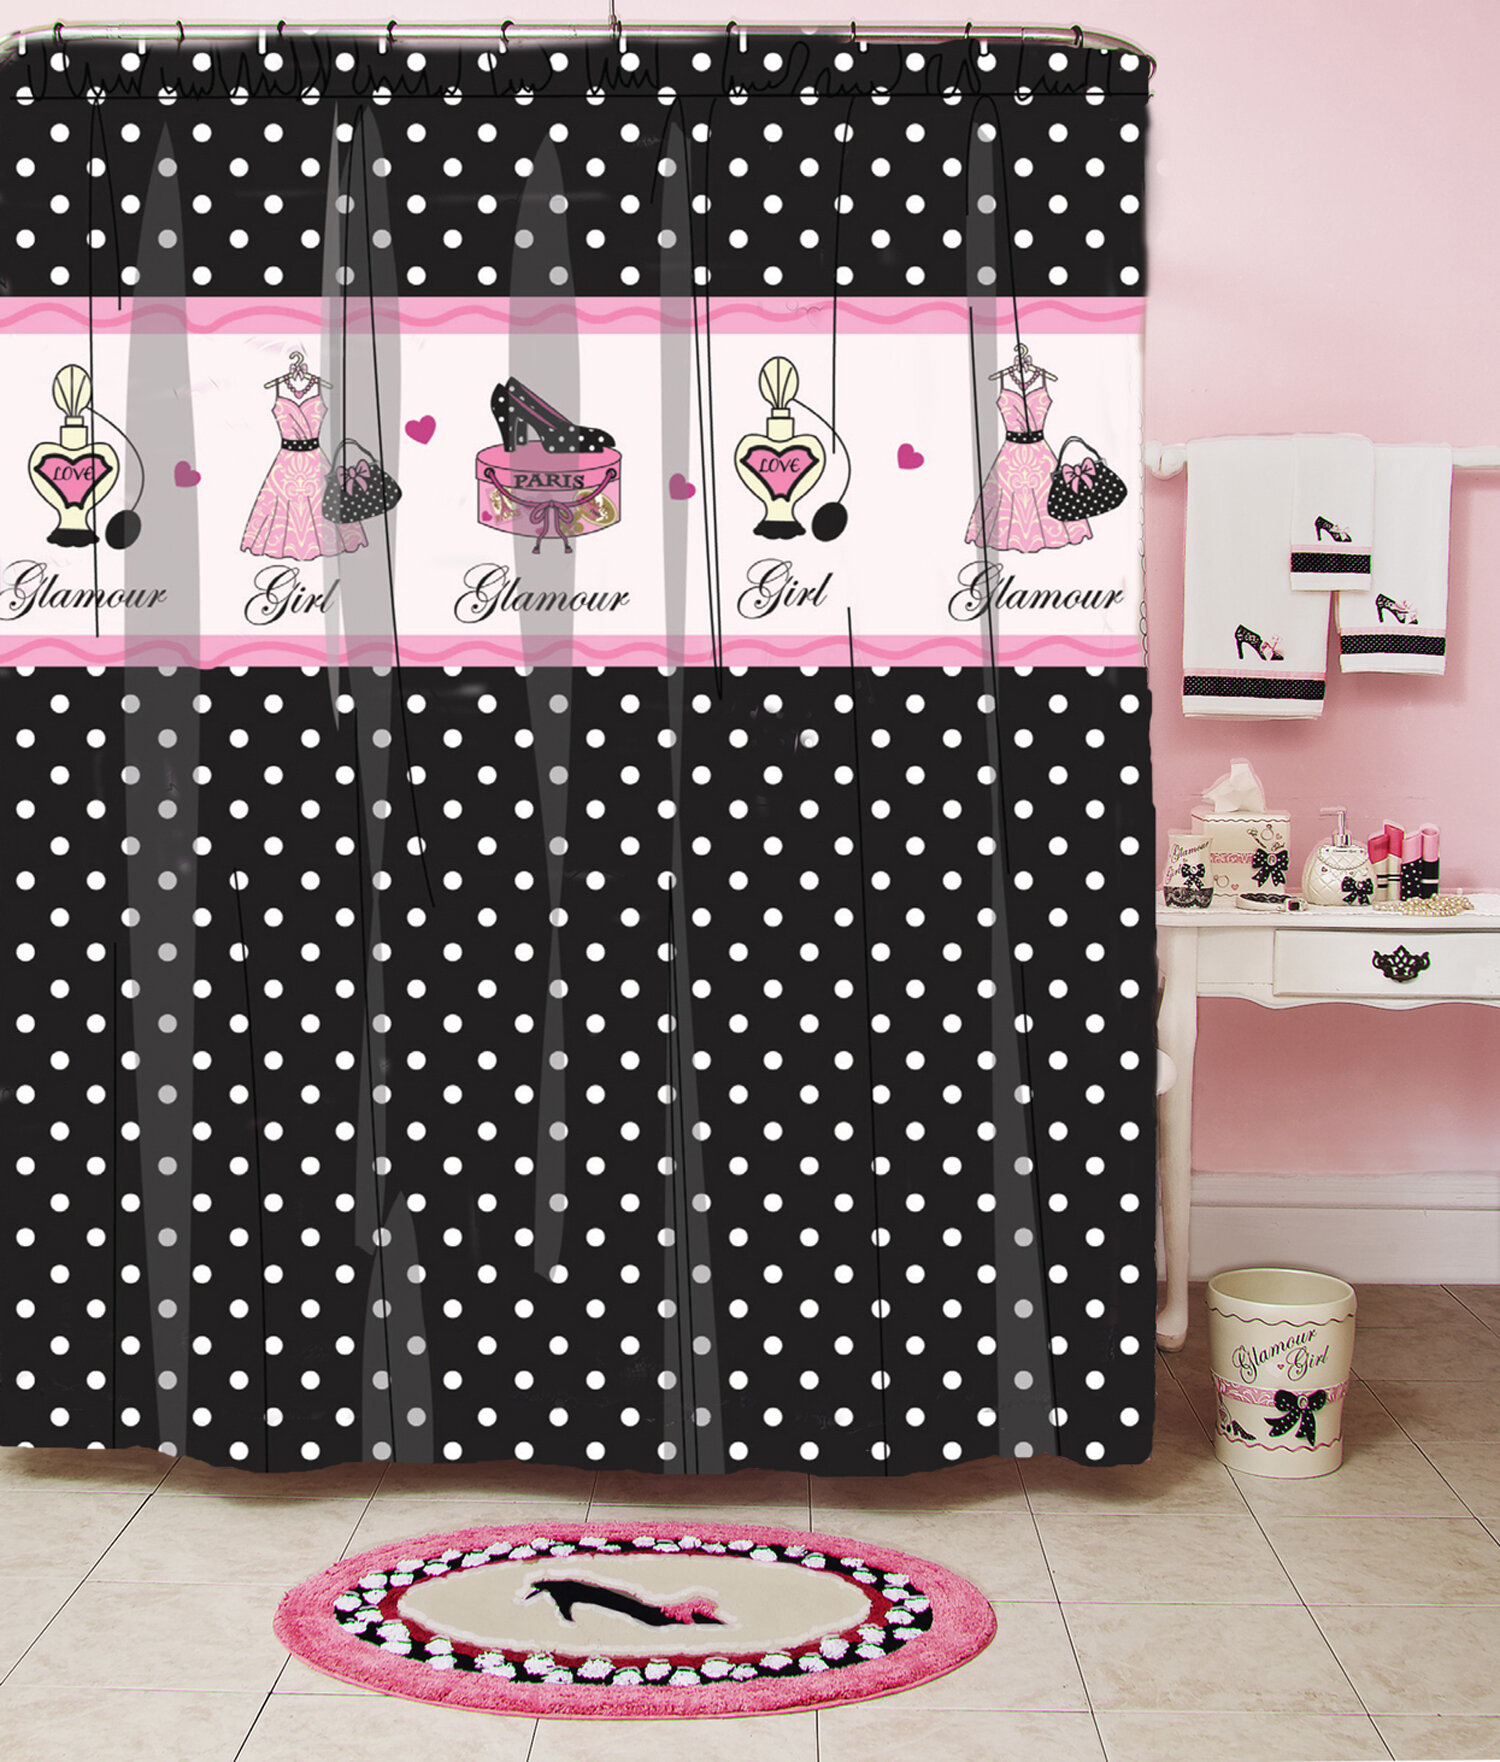 Homewear Linens Glamour Polka Dot Shower Curtain Reviews